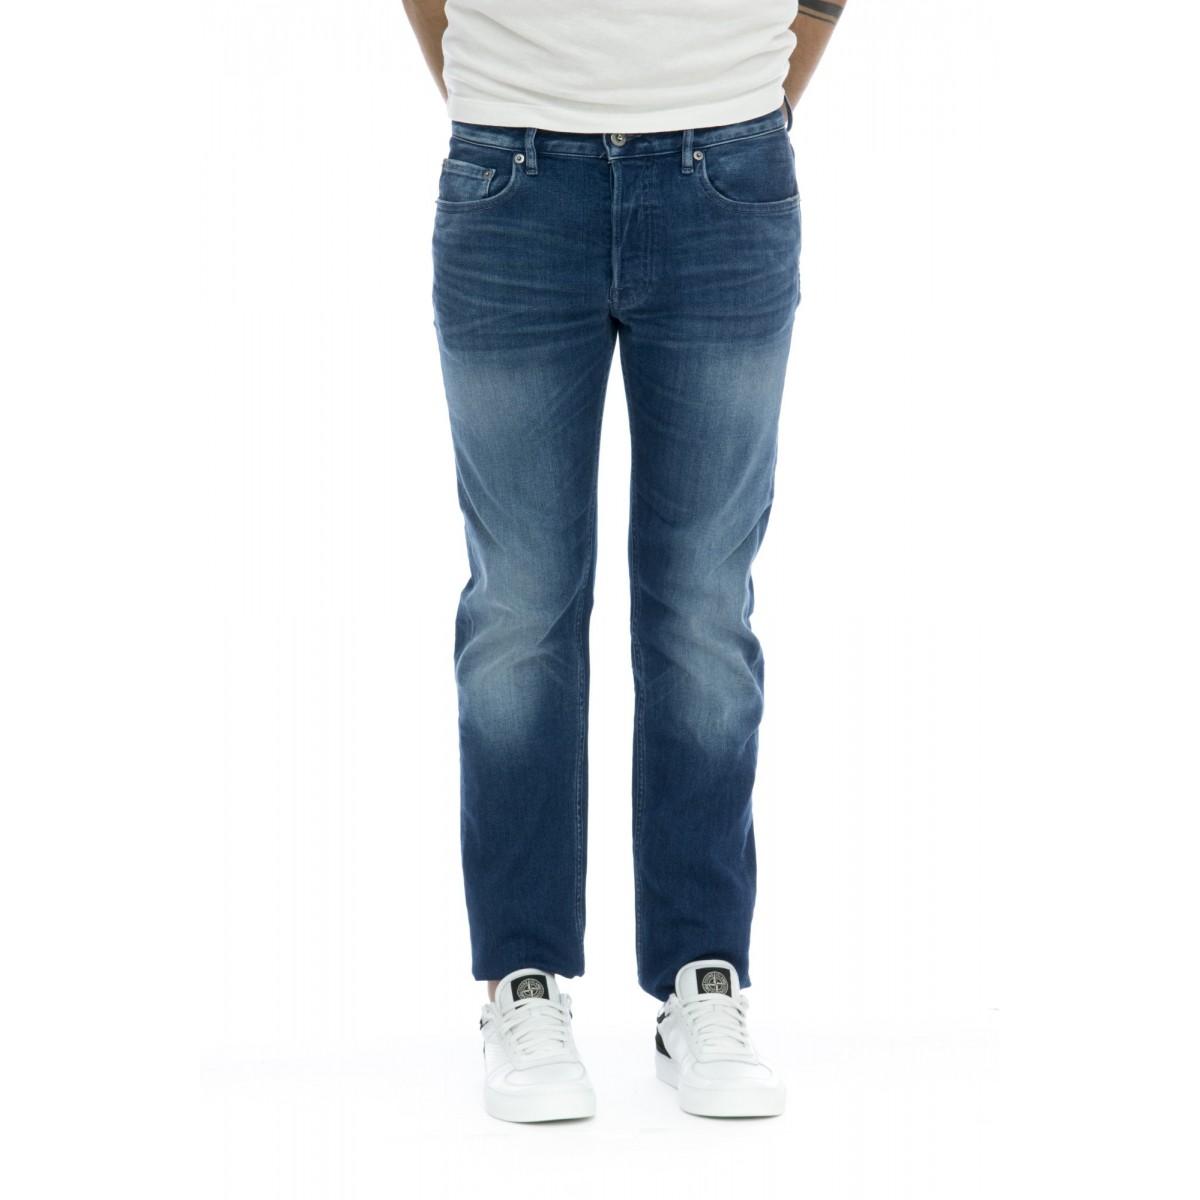 Jeans - J1bn4 jeans slim strech